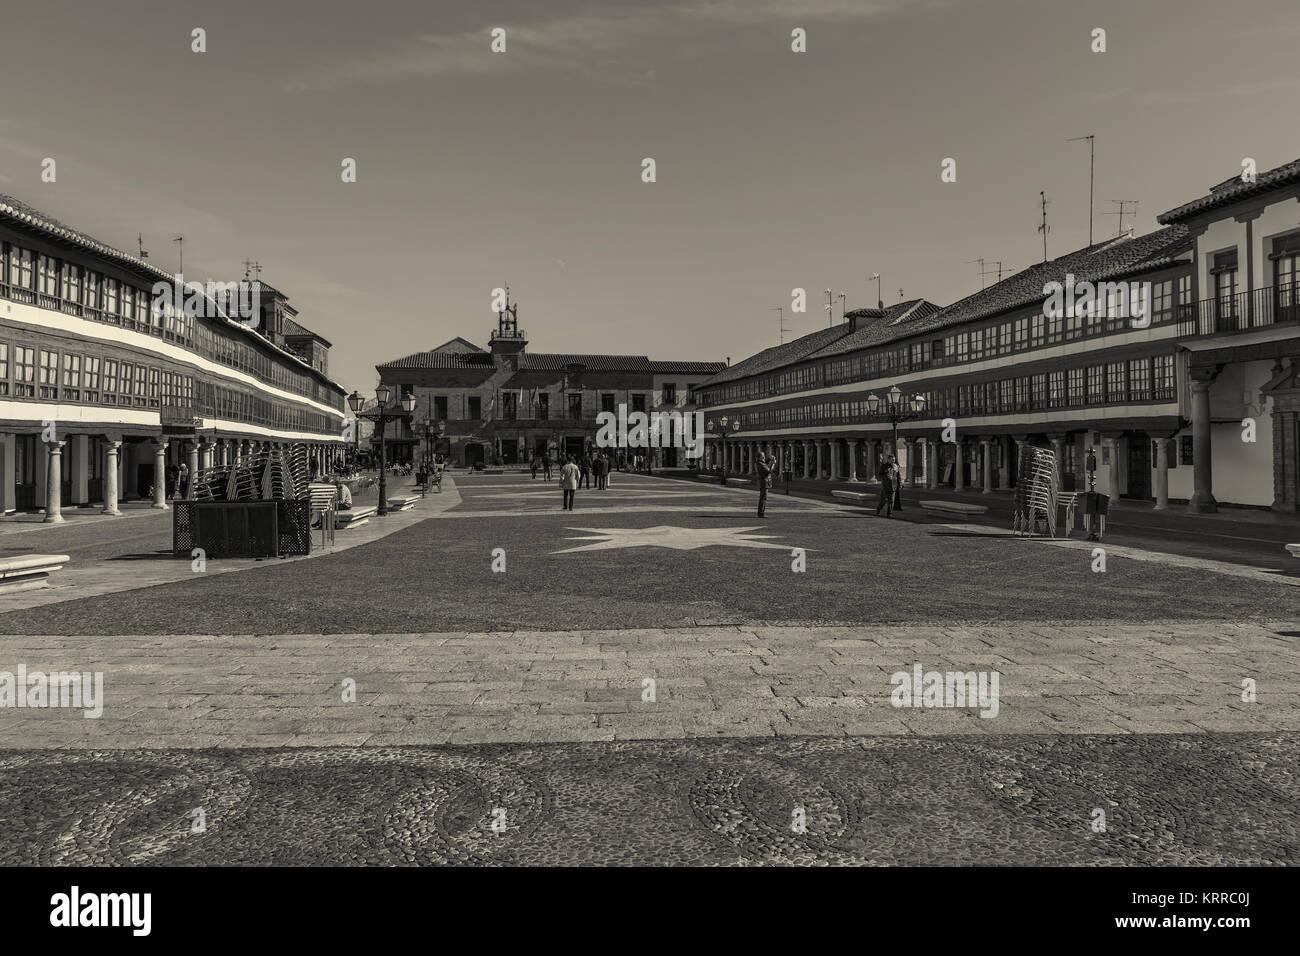 Peatonal Stock Photos Peatonal Stock Images Alamy # Muebles Liquidatodo Valladolid